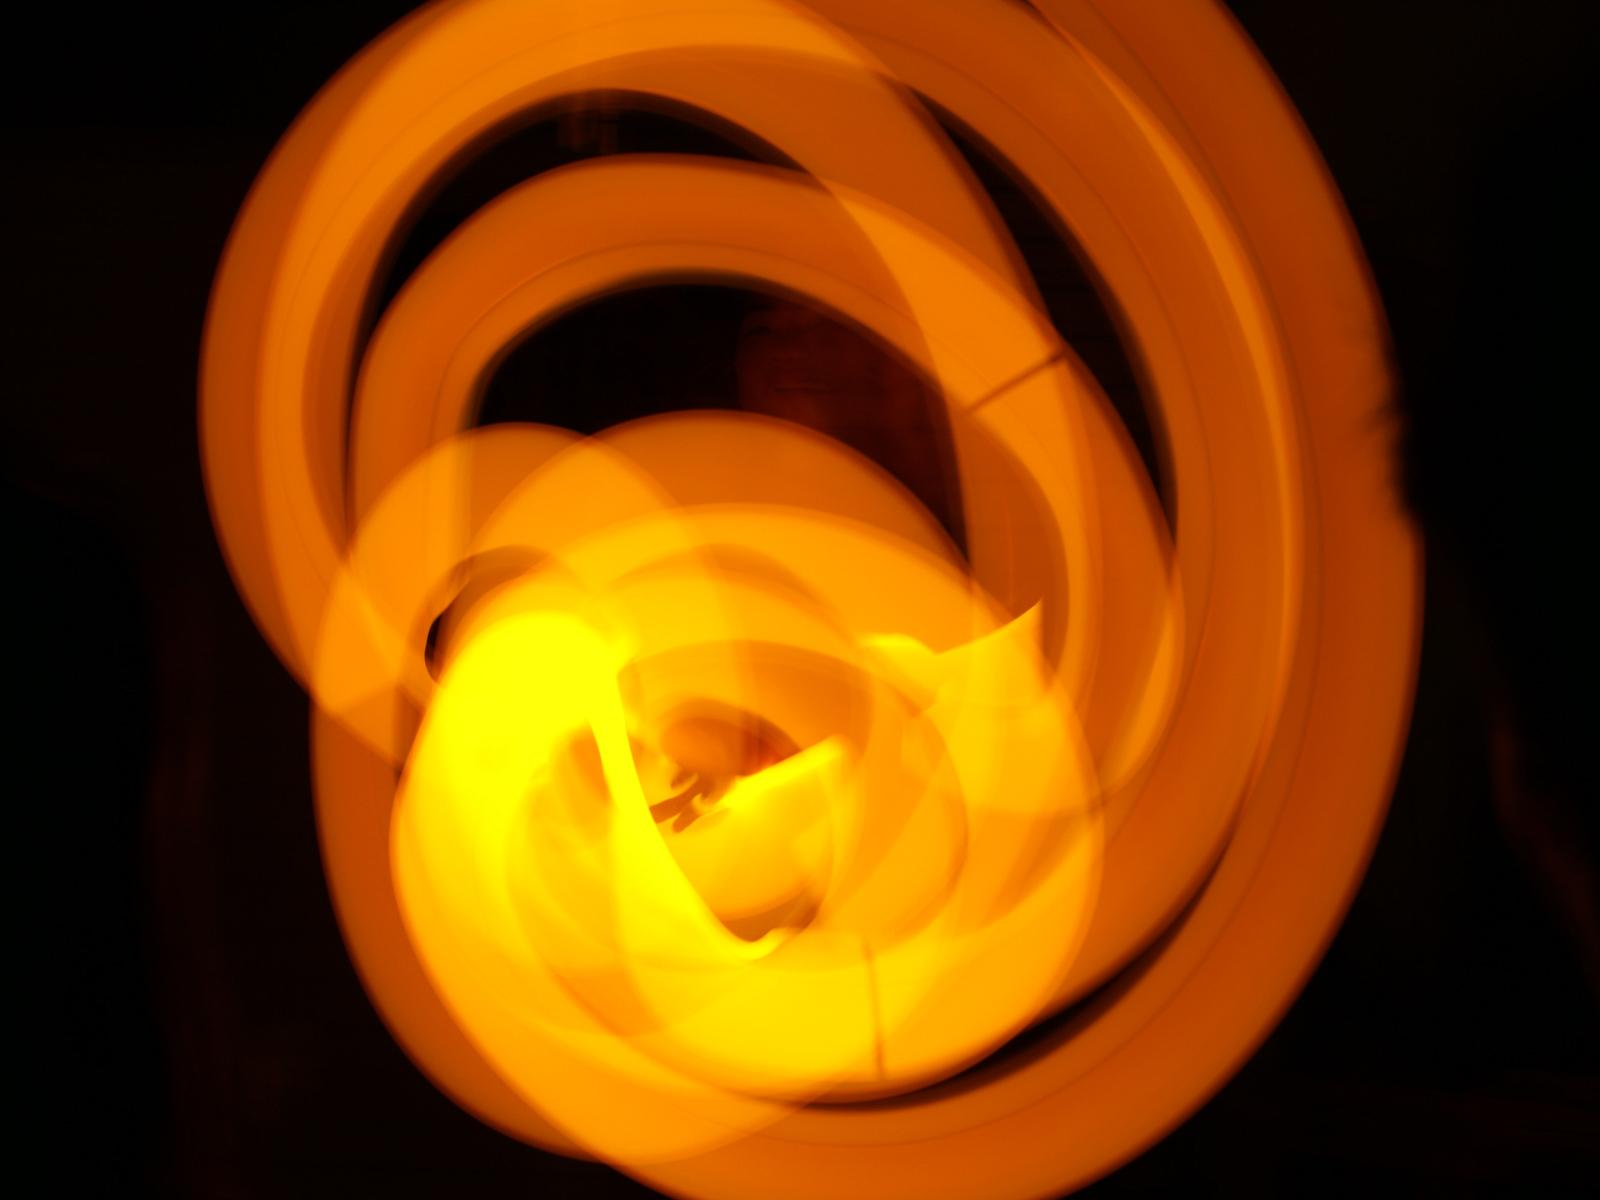 Orange Glowsticks PPT PPT Backgrounds